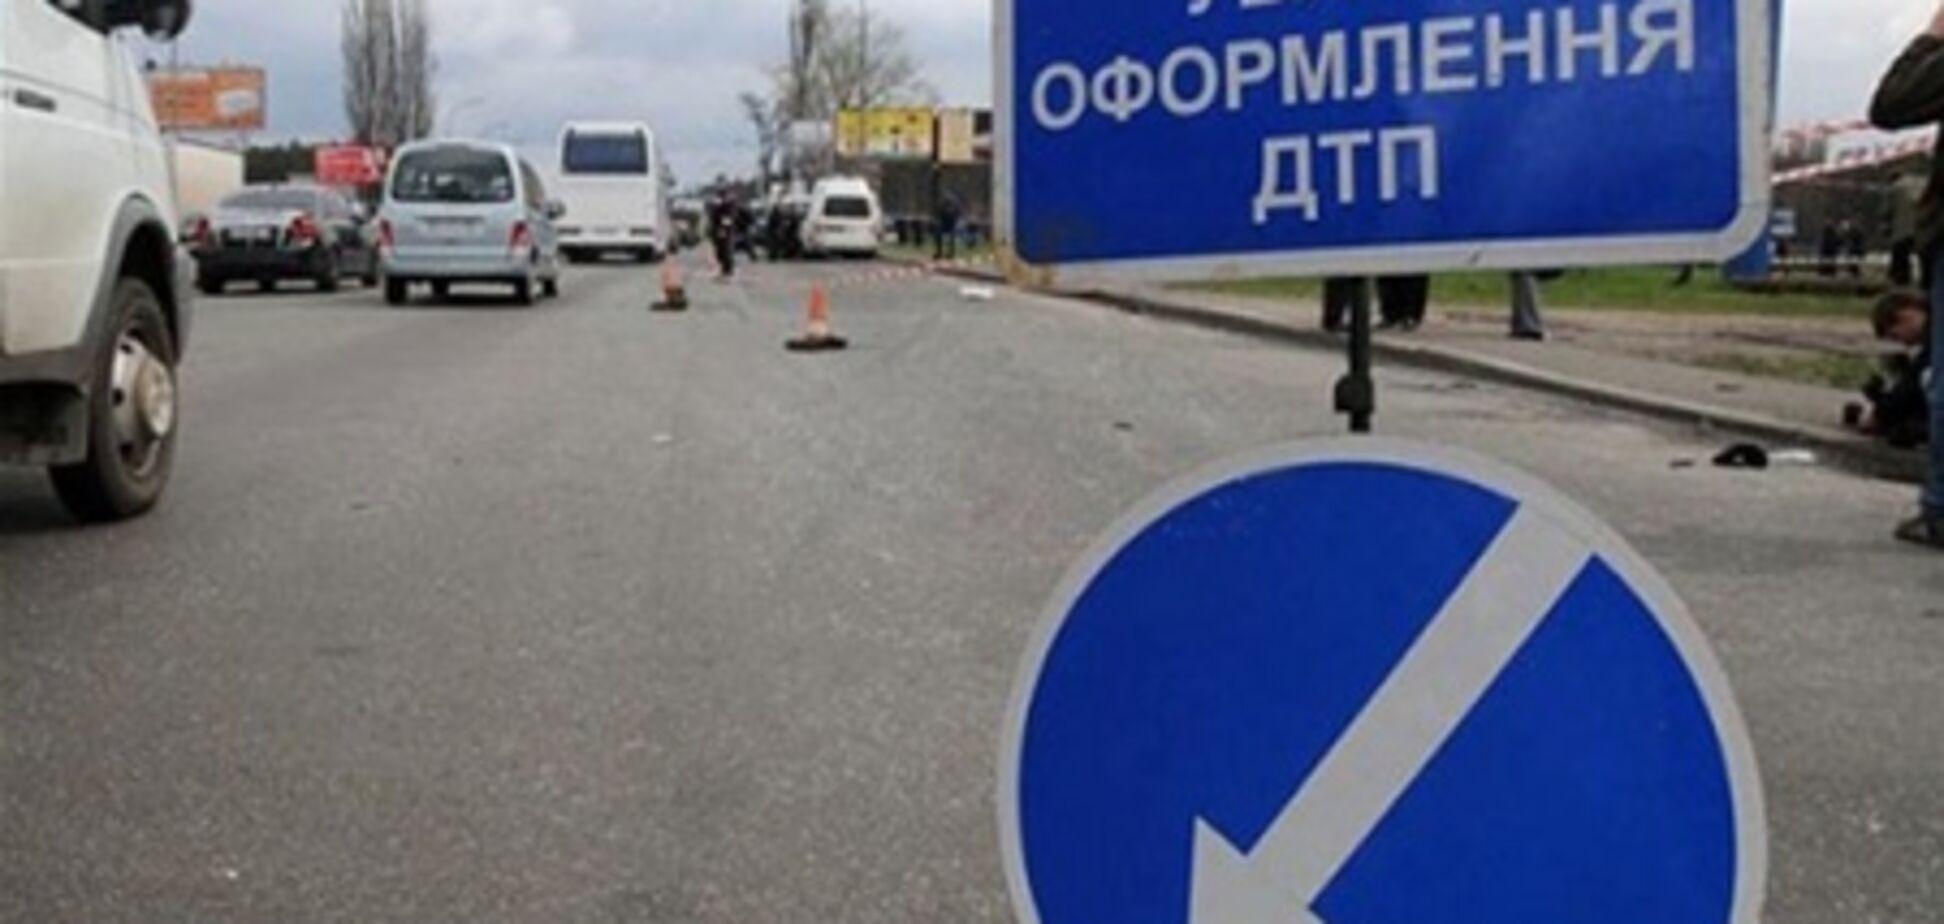 Ситуация на дорогах 6 октября: 106 ДТП, 16 погибших